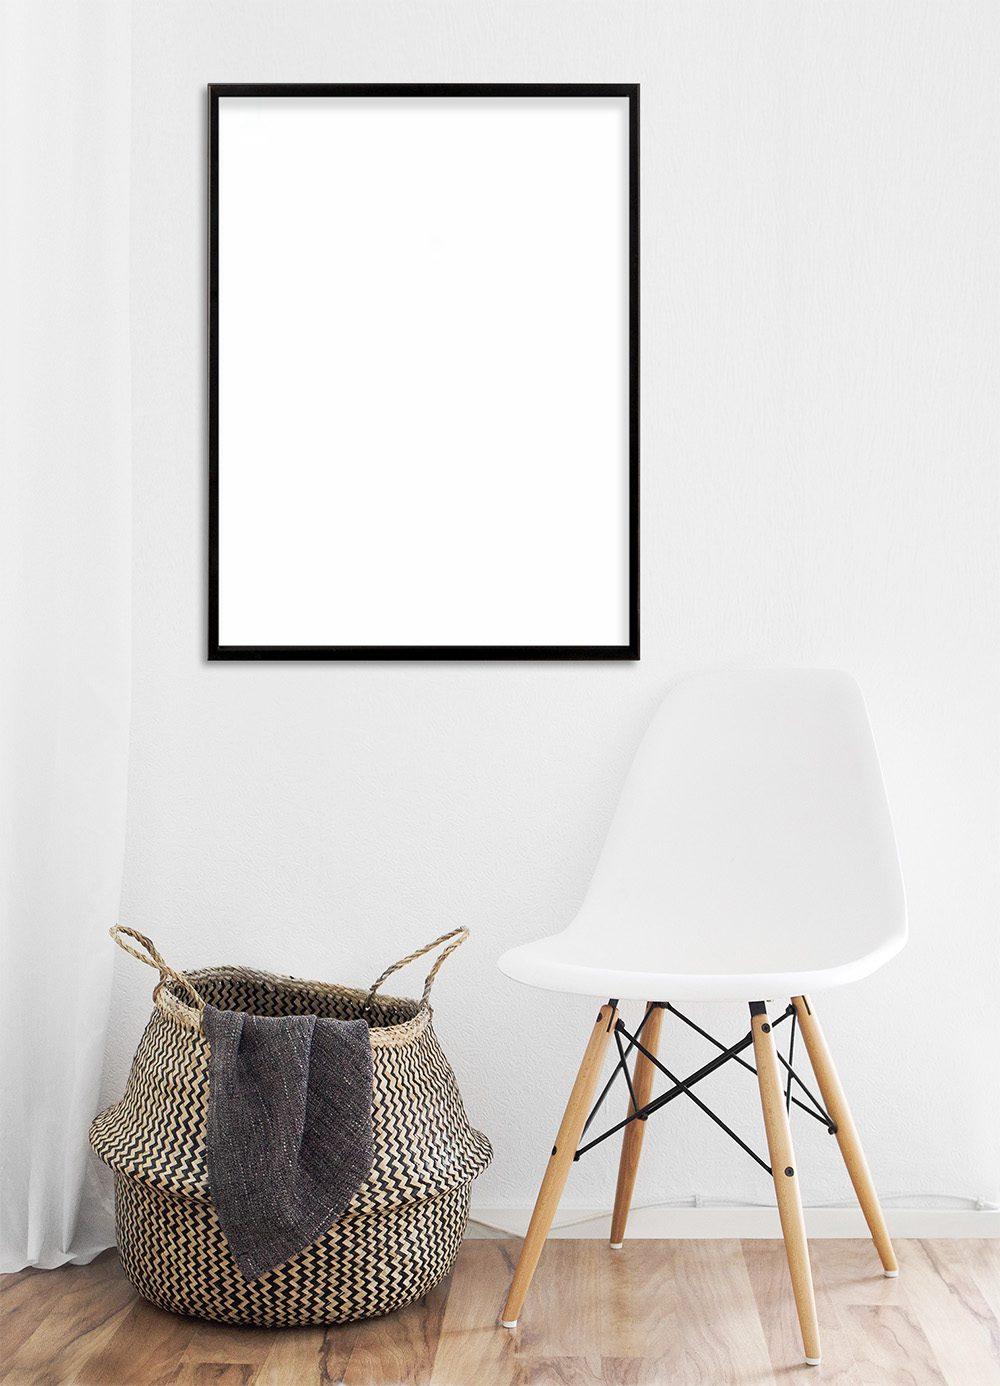 14-wall-poster-home-mockup-photoshop